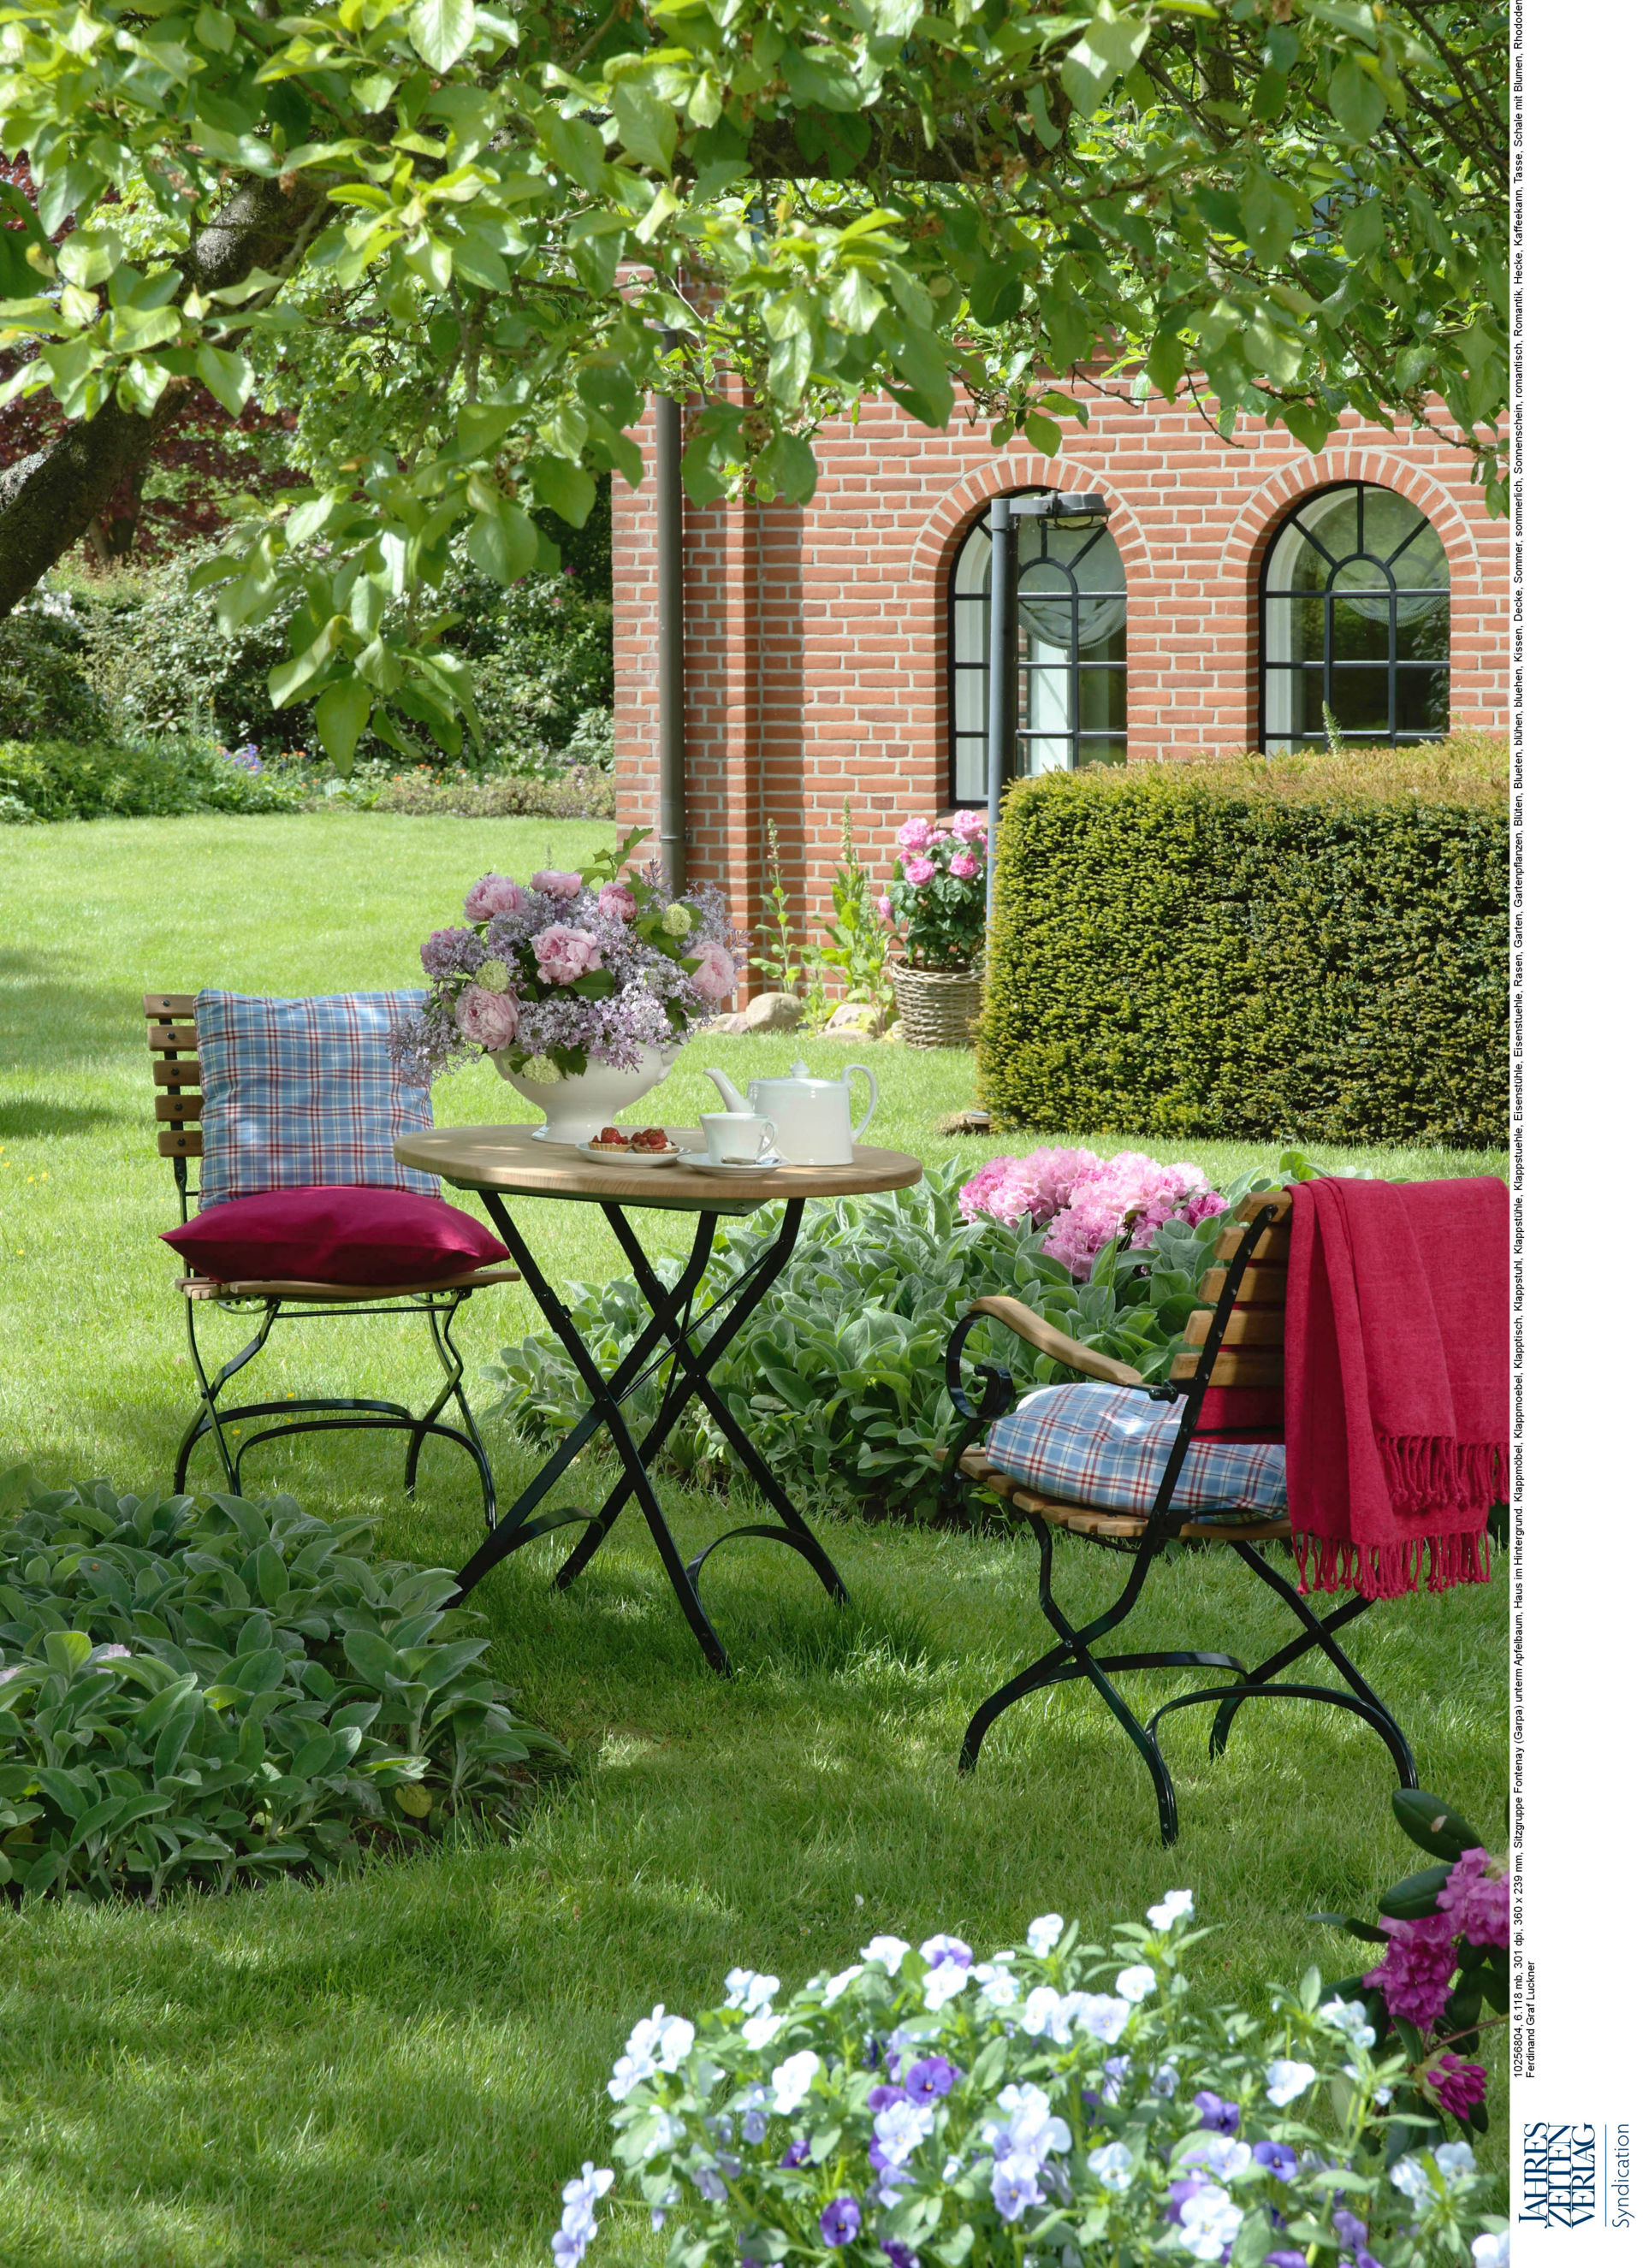 sitzecke garten sitzgruppe manila sitzecke garten terrasse balkon esstisch essecke echtholz wei. Black Bedroom Furniture Sets. Home Design Ideas